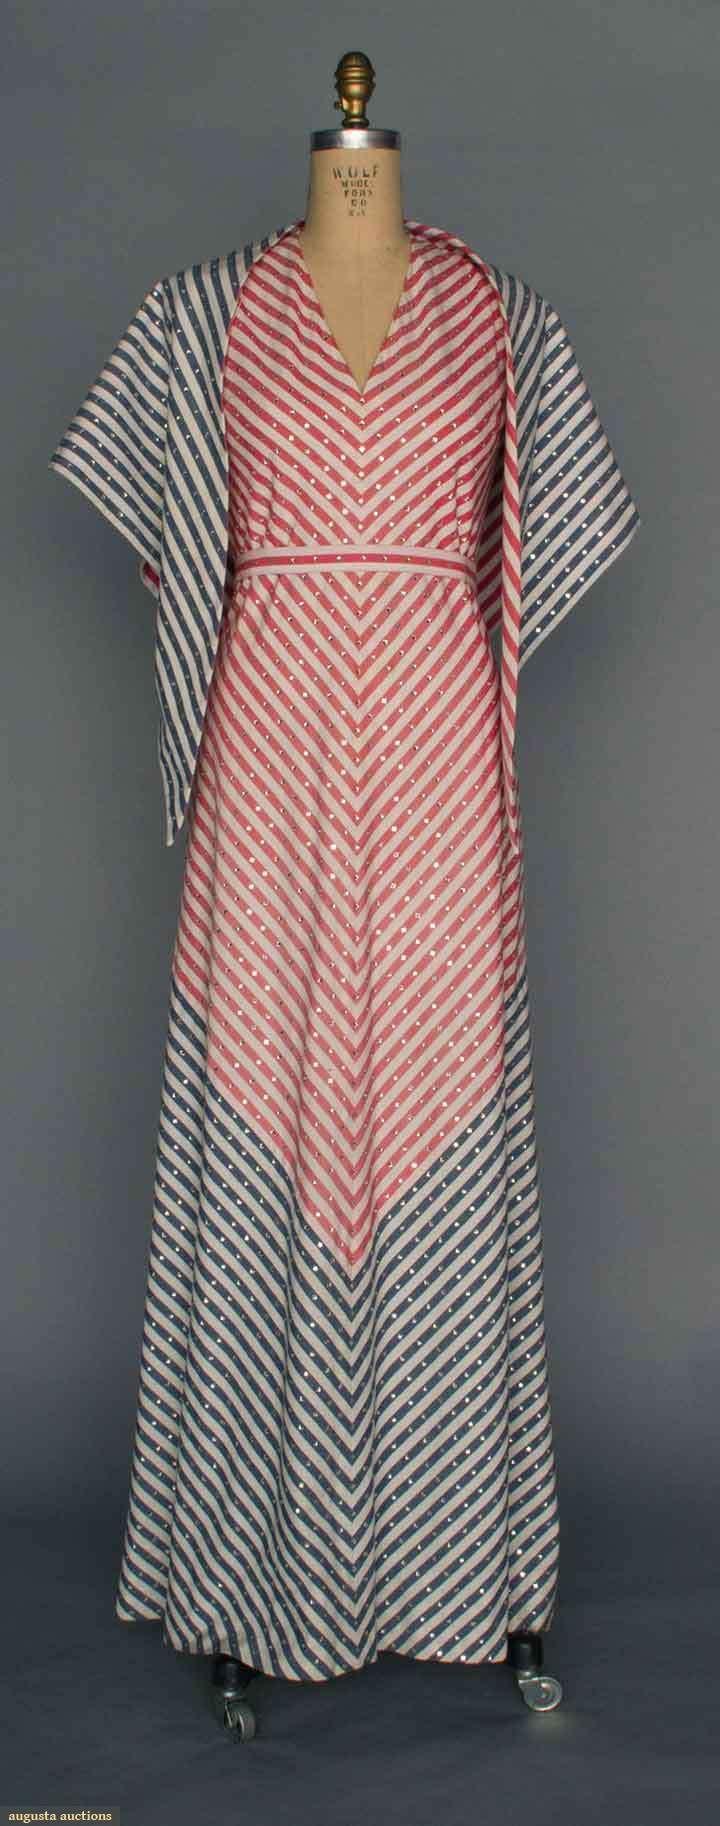 Trigere Bi-centennial Gown, 1976, Augusta Auctions, April 9, 2014 - NYC